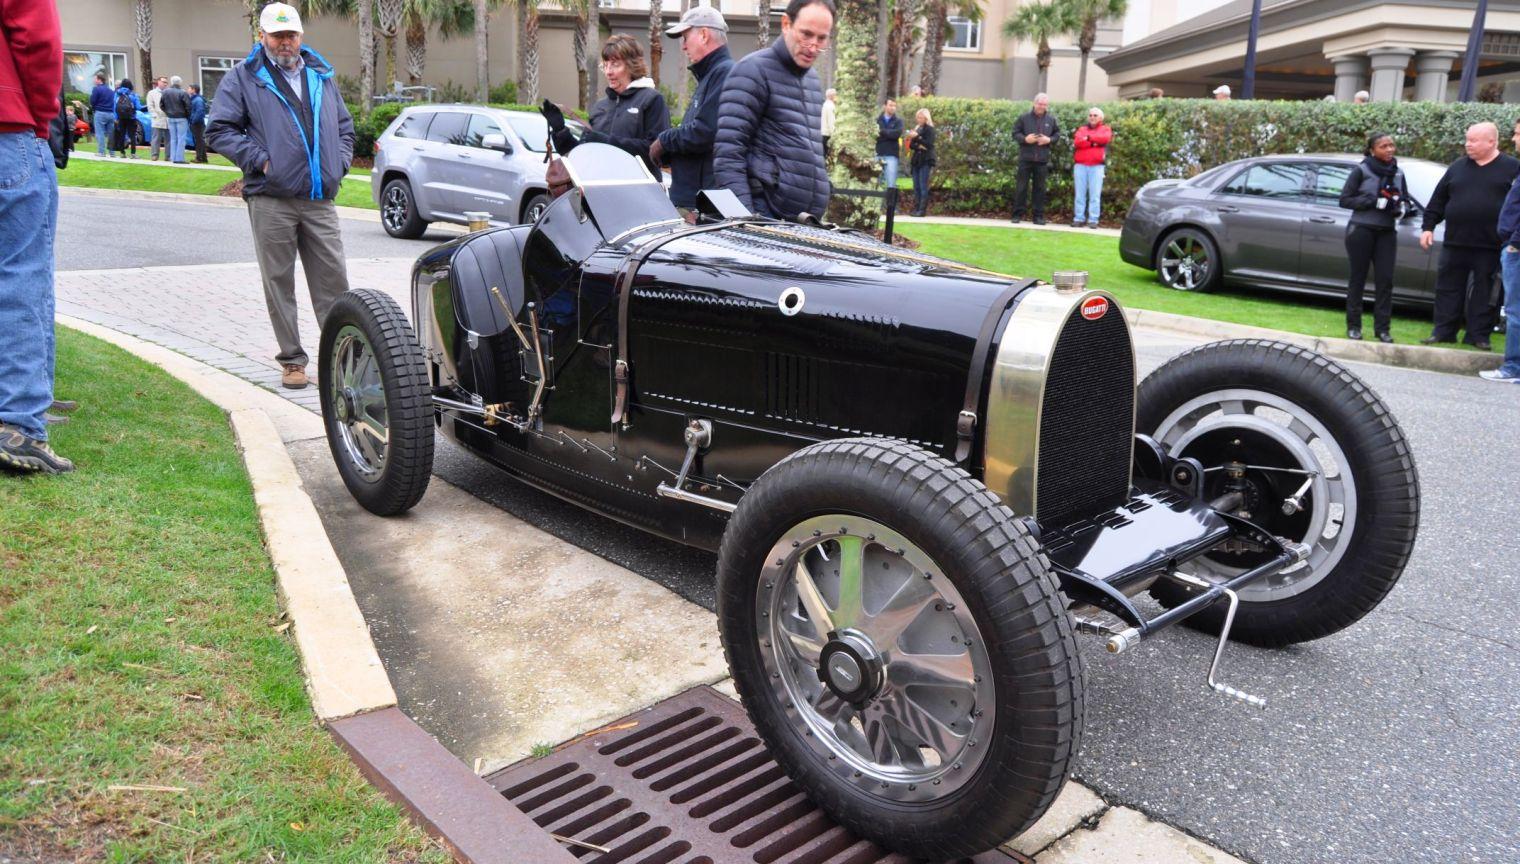 PurSang Argentina Shows Innovative Marketing with Street-Parked 1920s Bugatti GP Car22